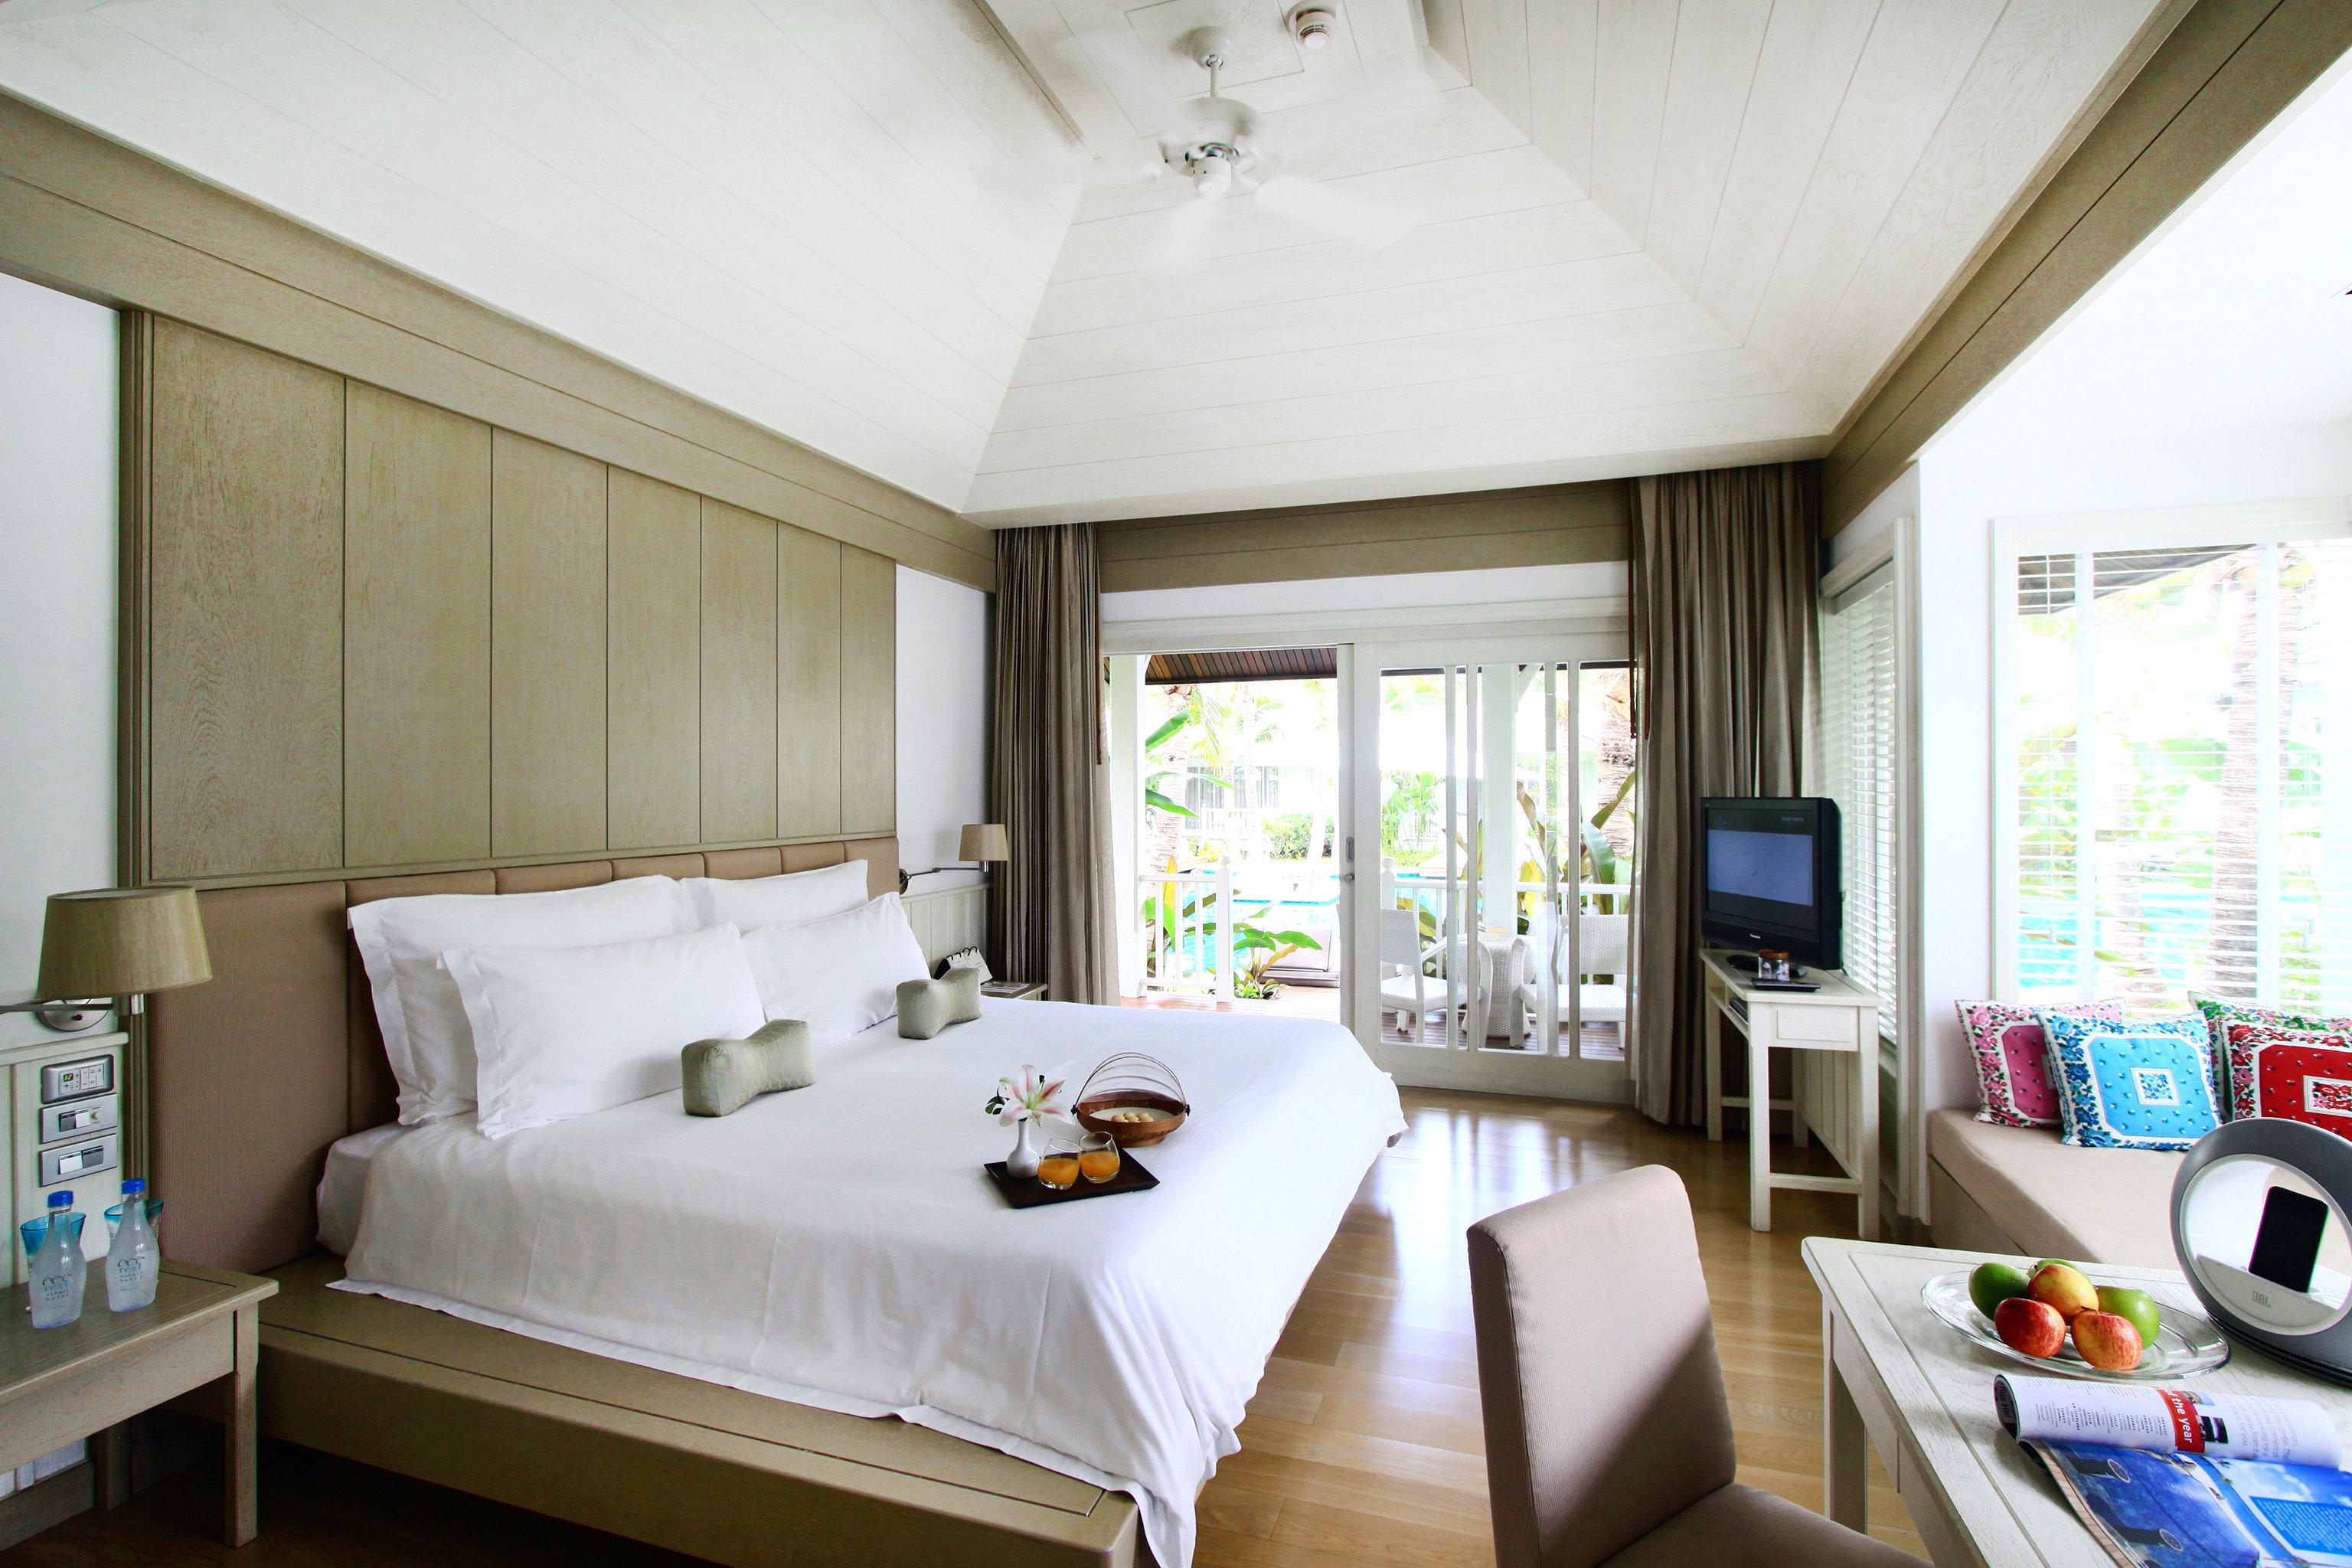 Balcony Beachfront Bedroom Jungle Romantic Tropical property living room Suite home condominium cottage Villa